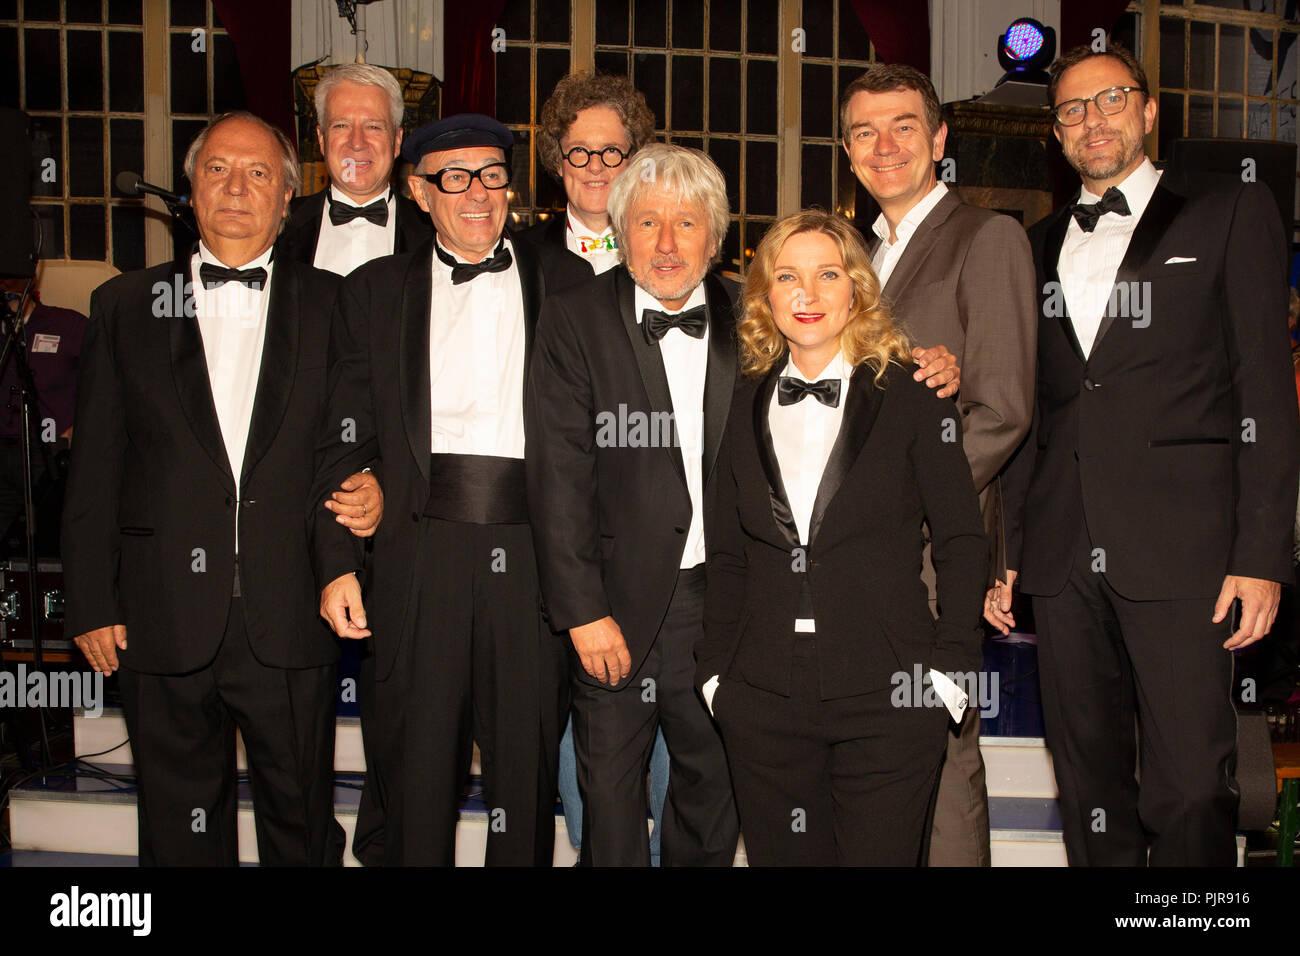 (v.l.) Wilfried Schmickler, Helmut Zanoskar (Regisseur), Uwe Lyko als Herbert Knebel, Klaus Michael Heinz (Redakteur), Jürgen Becker, Susanne Petzold, - Stock Image